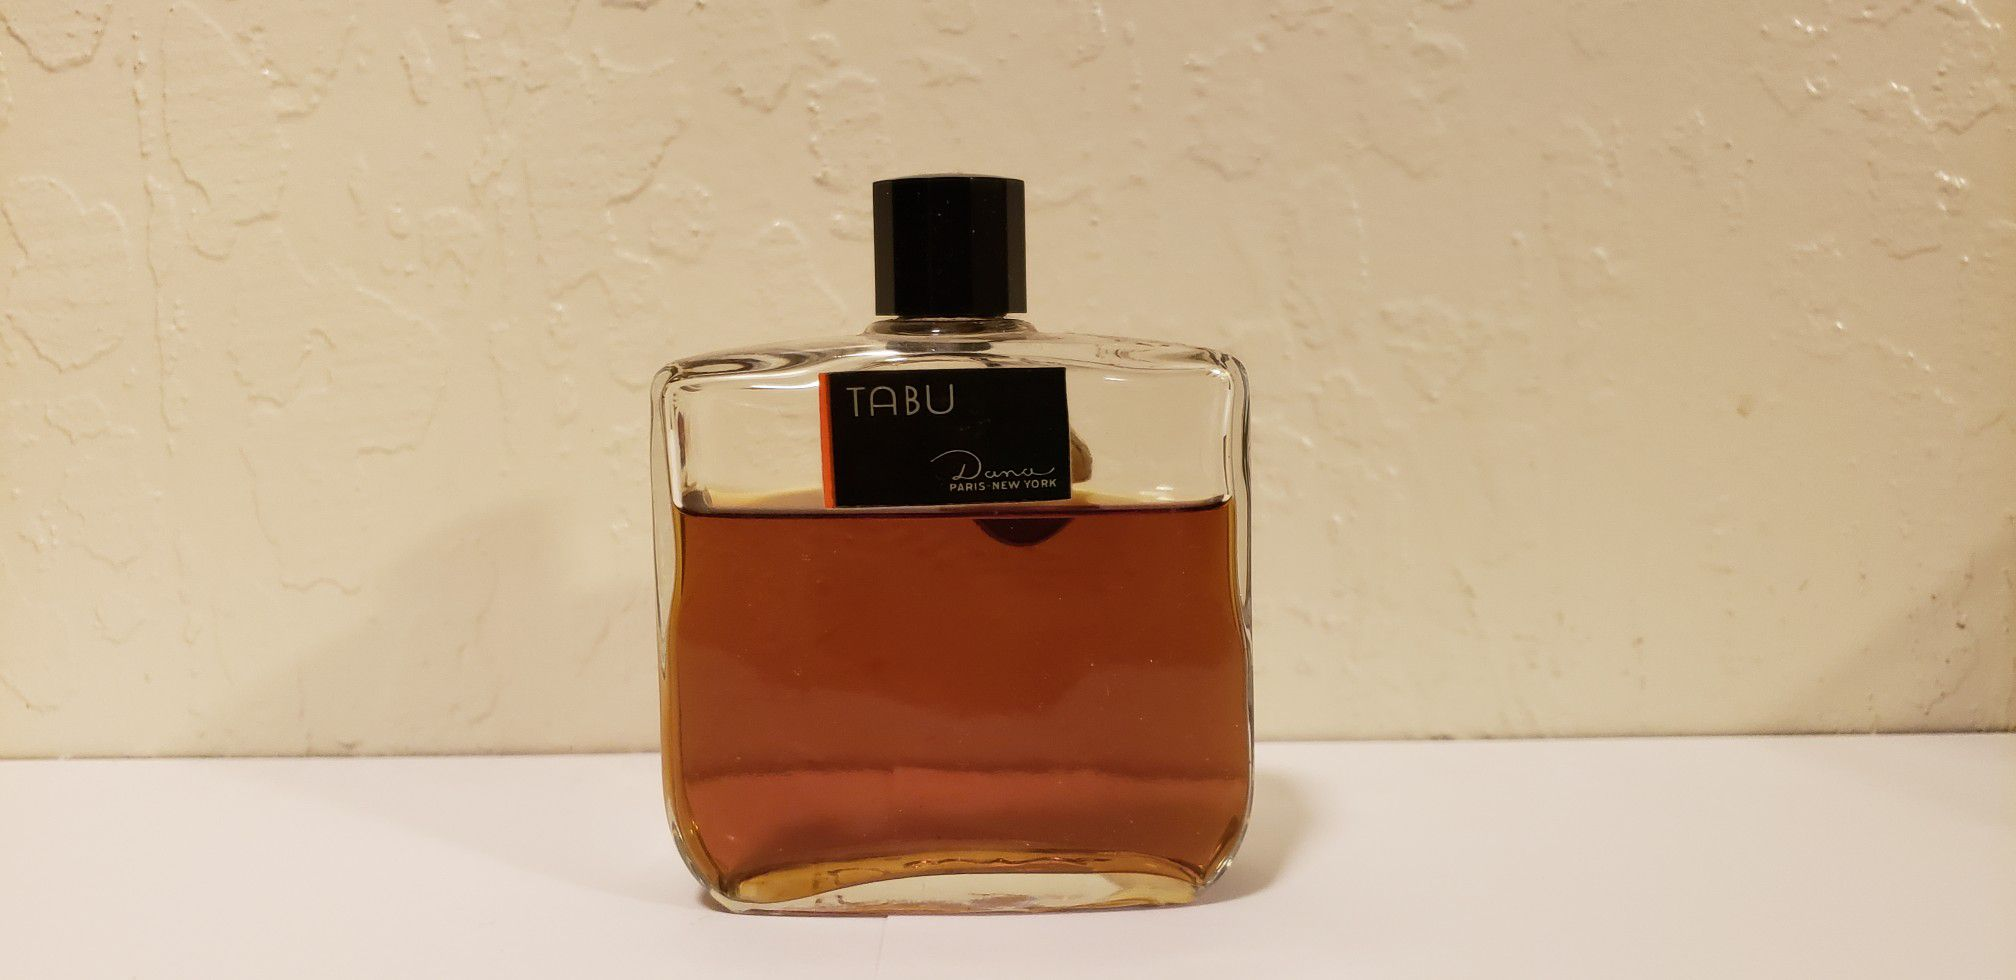 Tabu by Dana perfume 4fl oz